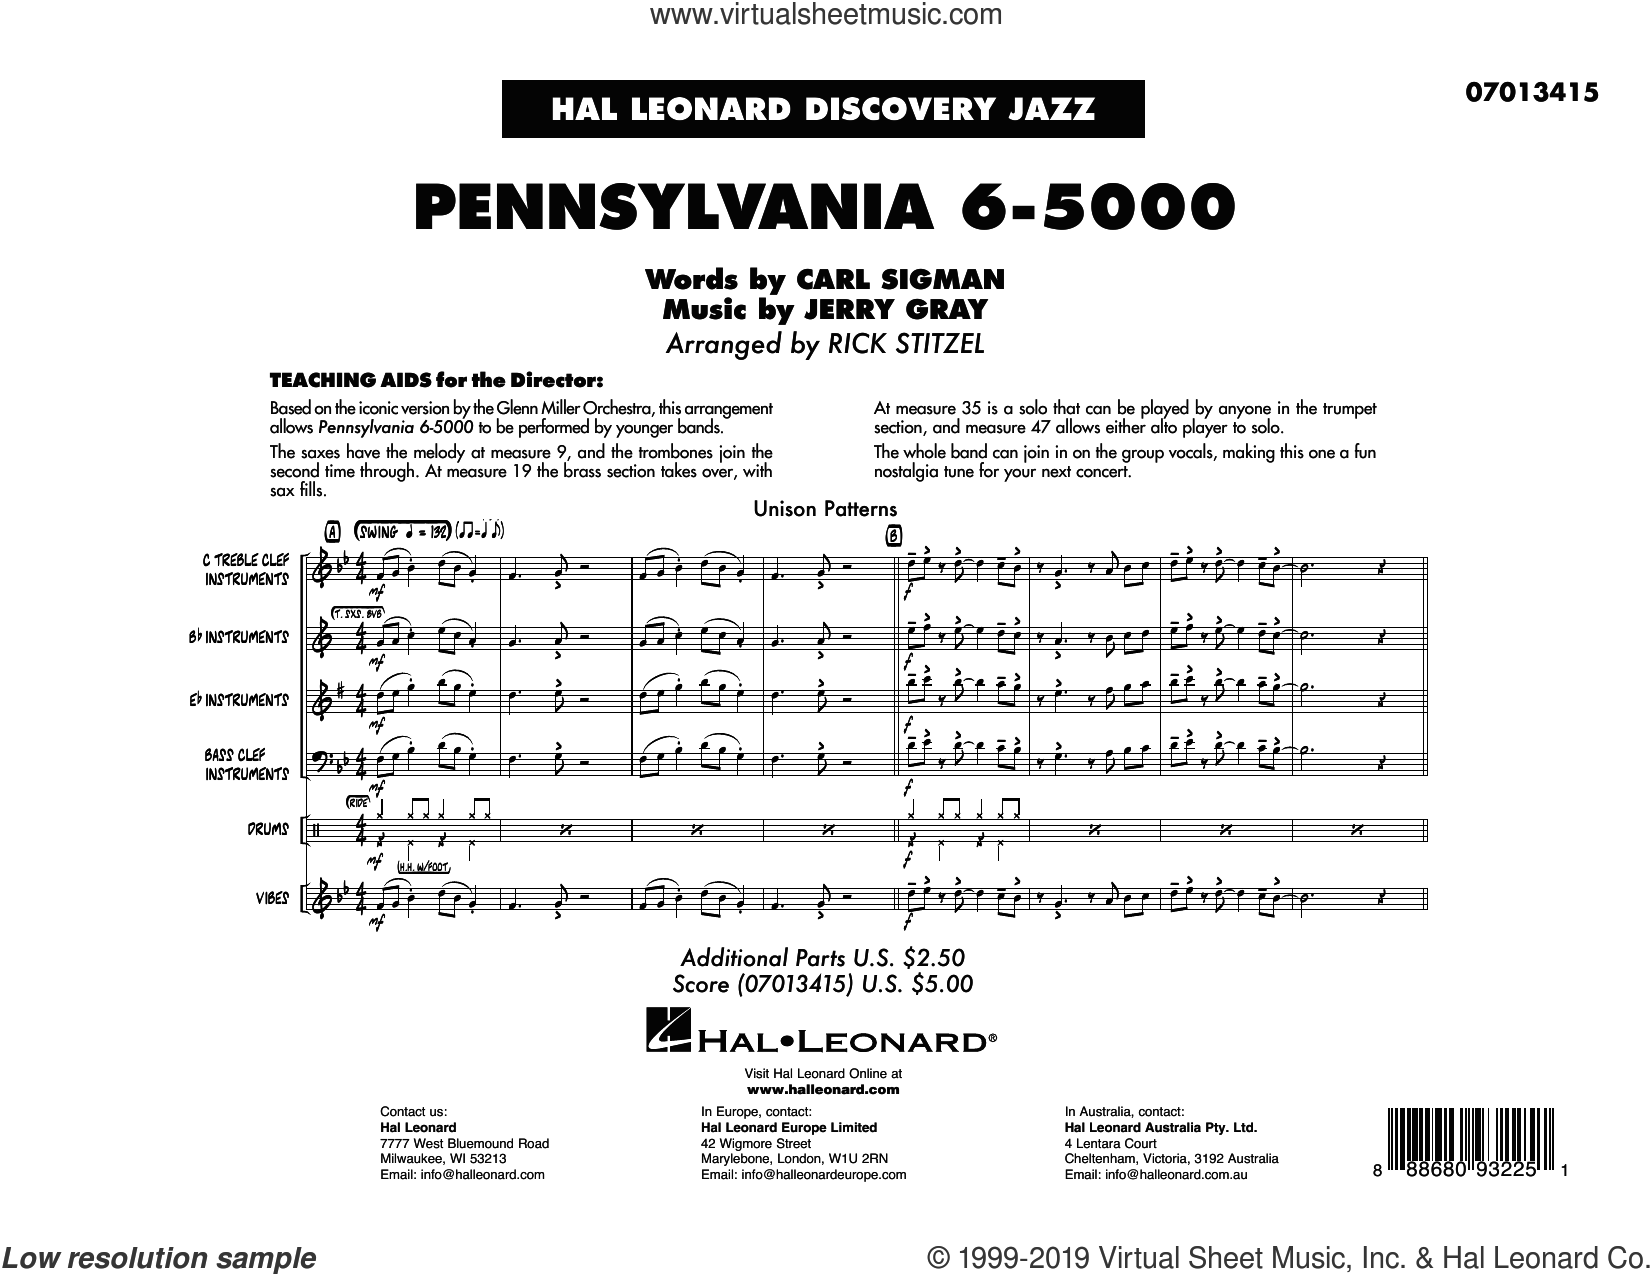 Pennsylvania 6-5000 (arr. Rick Stitzel) (COMPLETE) sheet music for jazz band by Glenn Miller Orchestra, Carl Sigman, Jerry Gray and Rick Stitzel, intermediate skill level